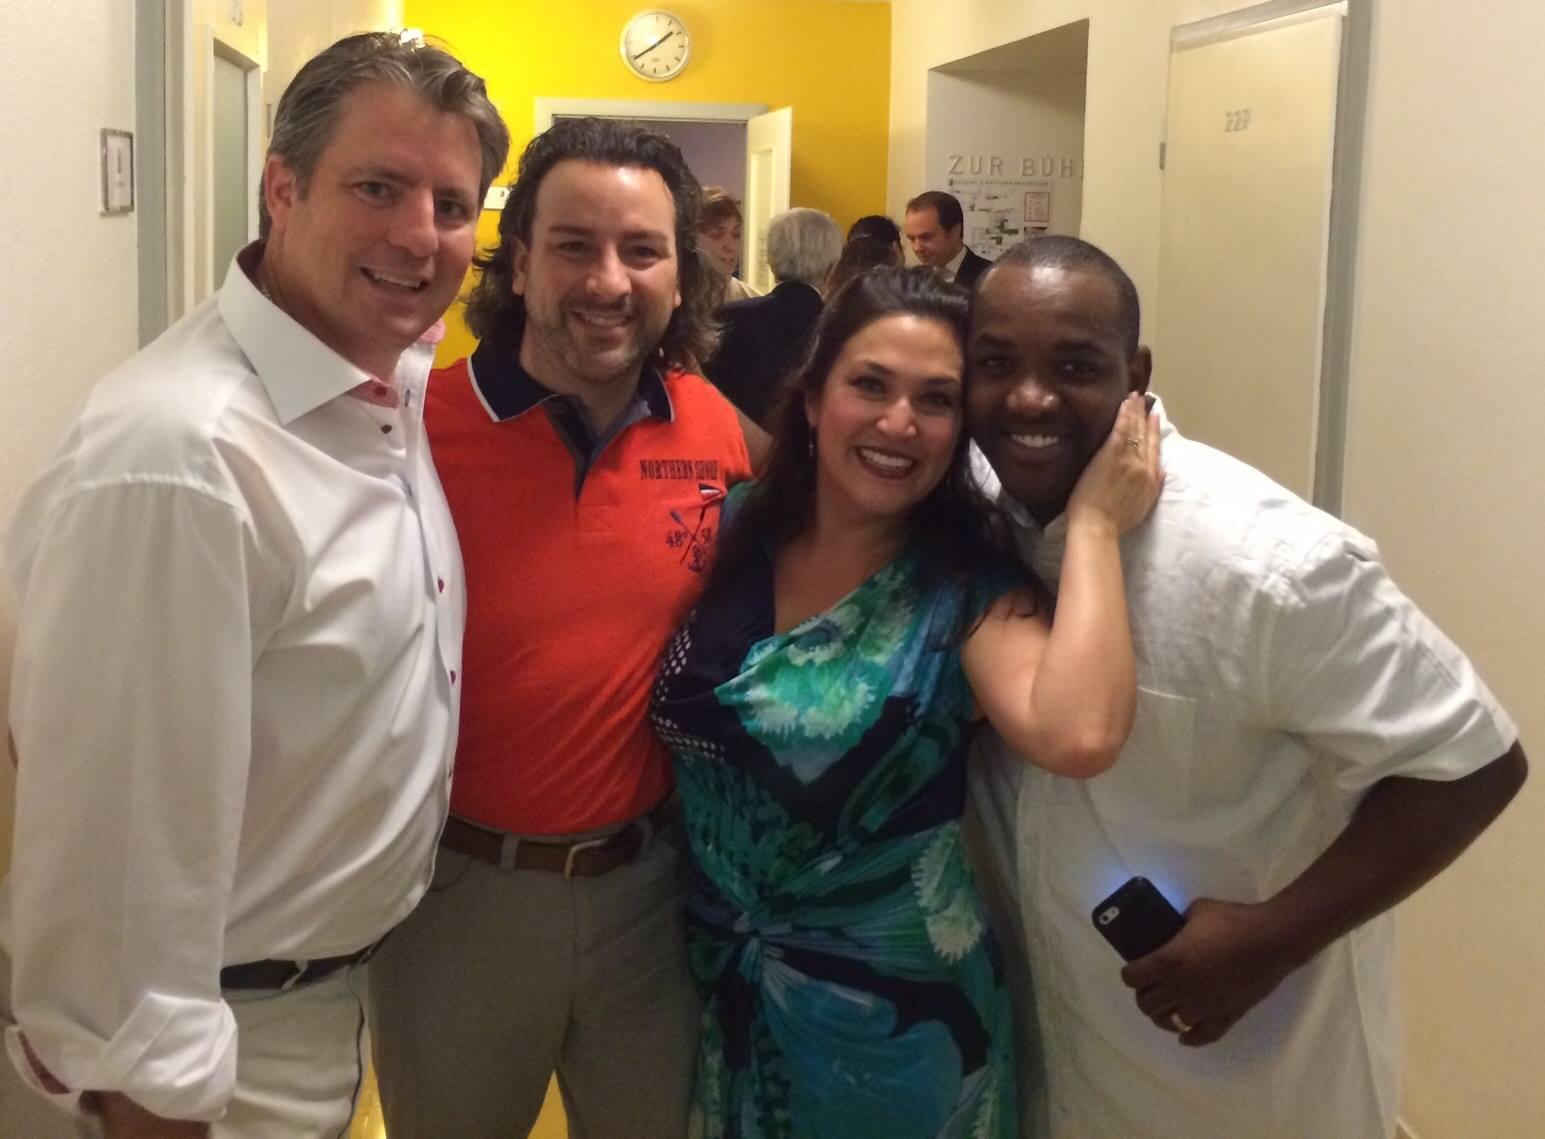 John Osborn, Matthew Polenzani, Lynette Tapia